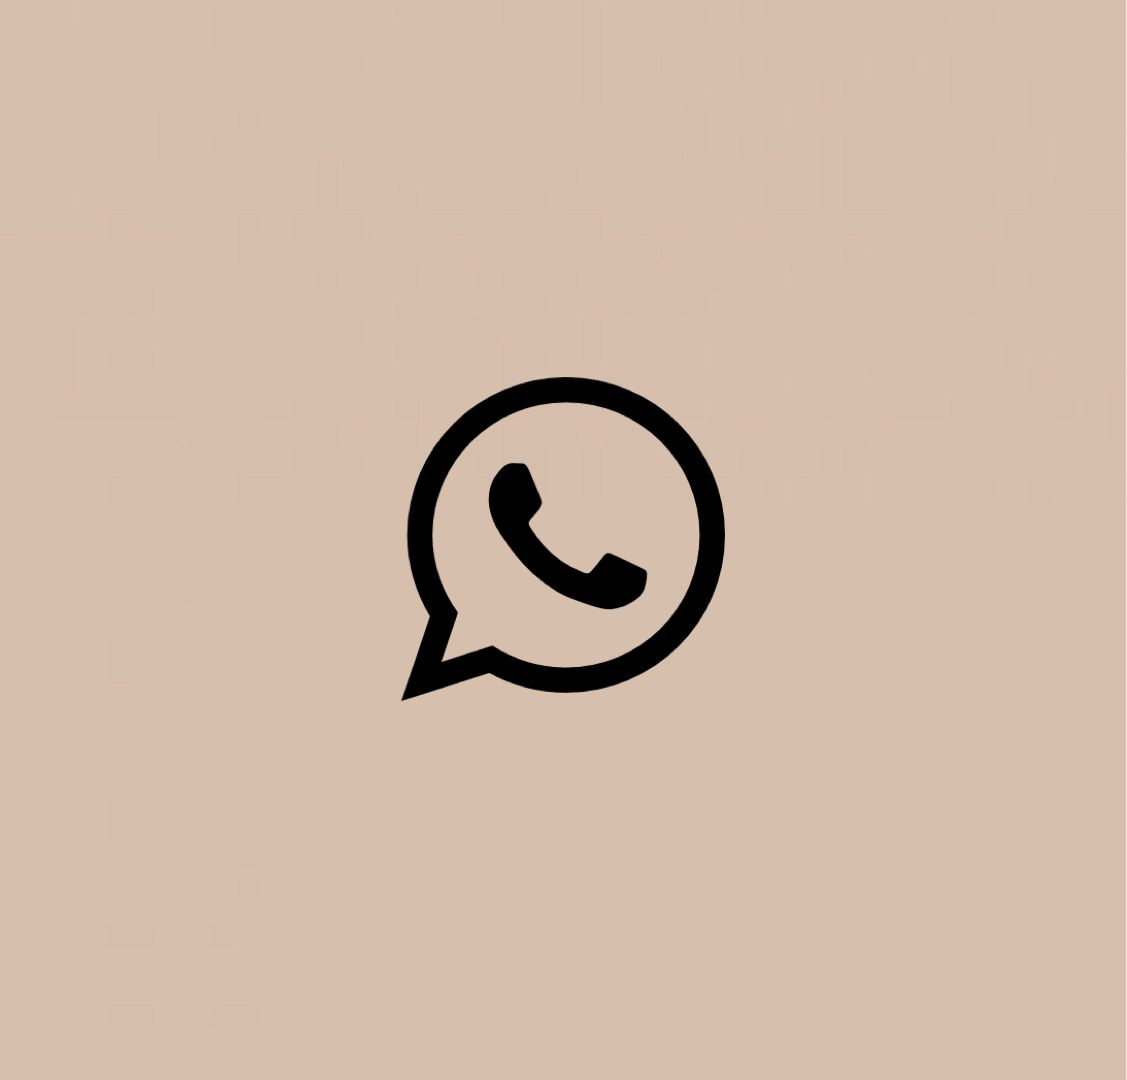 Ios 14 App Cover Whatsapp Anwendungssymbol Symbol